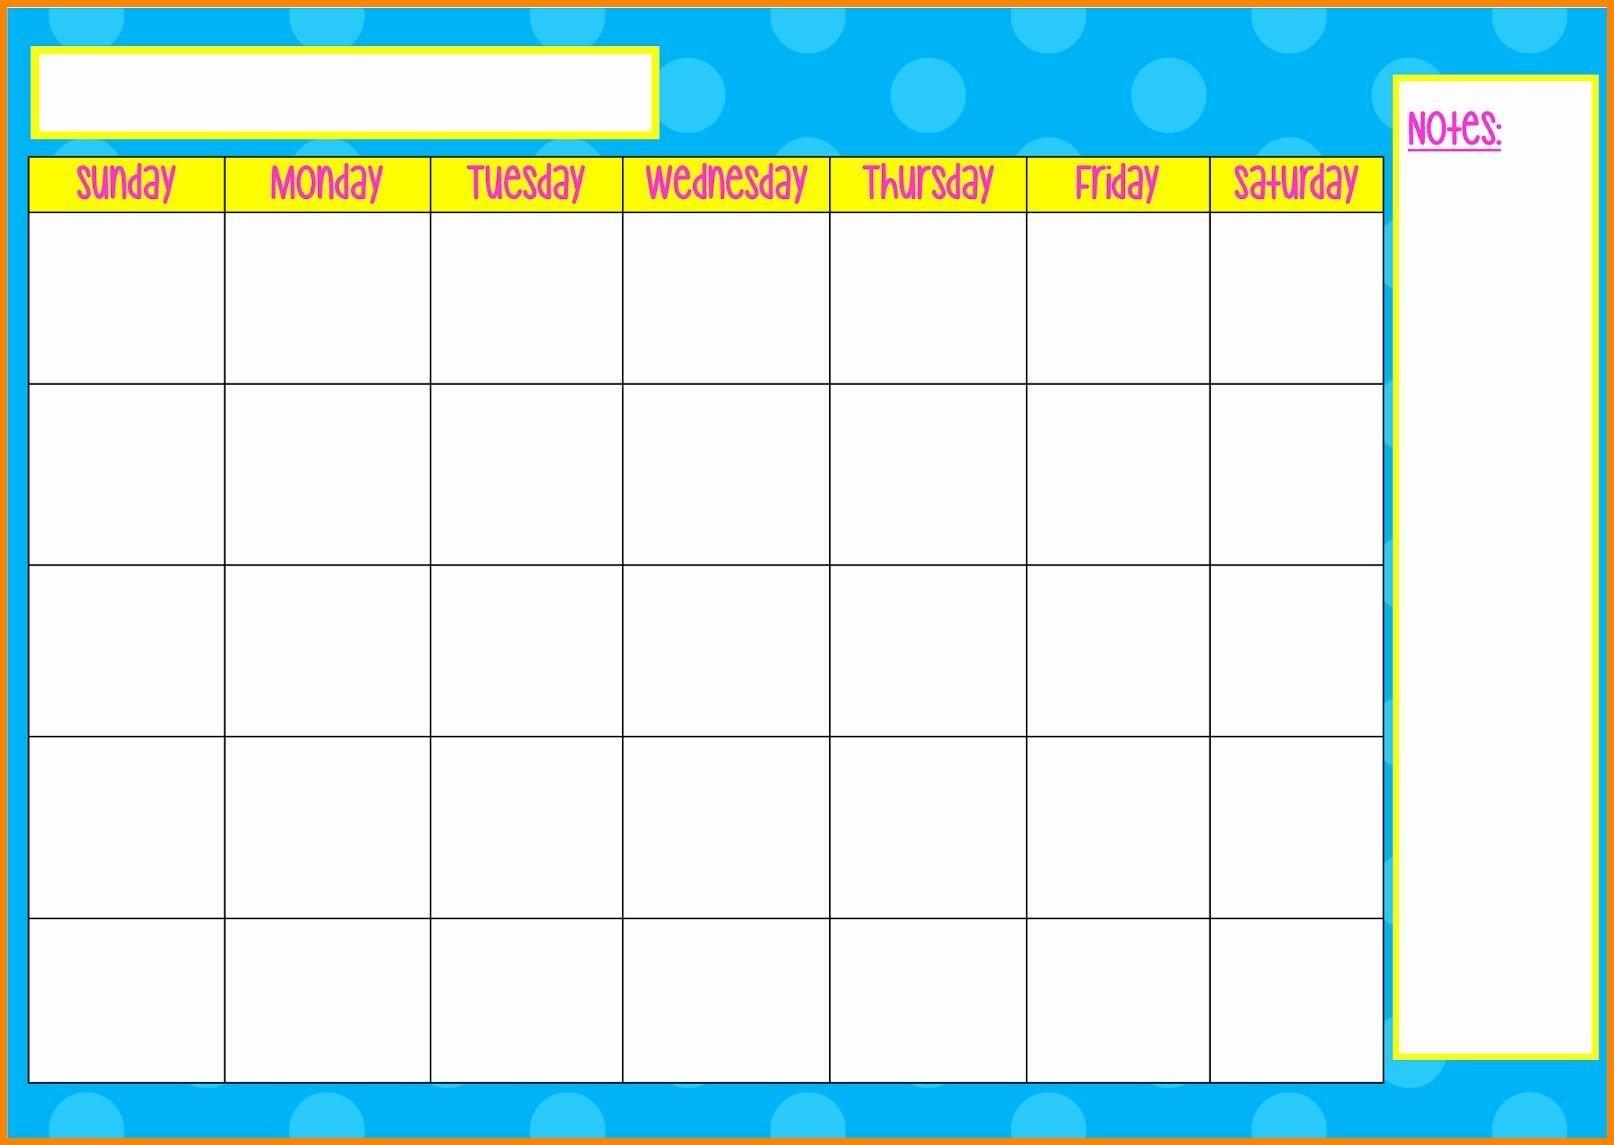 How To Monday Through Friday Calendar Word | Get Your Free Blank Monday Through Friday Calander